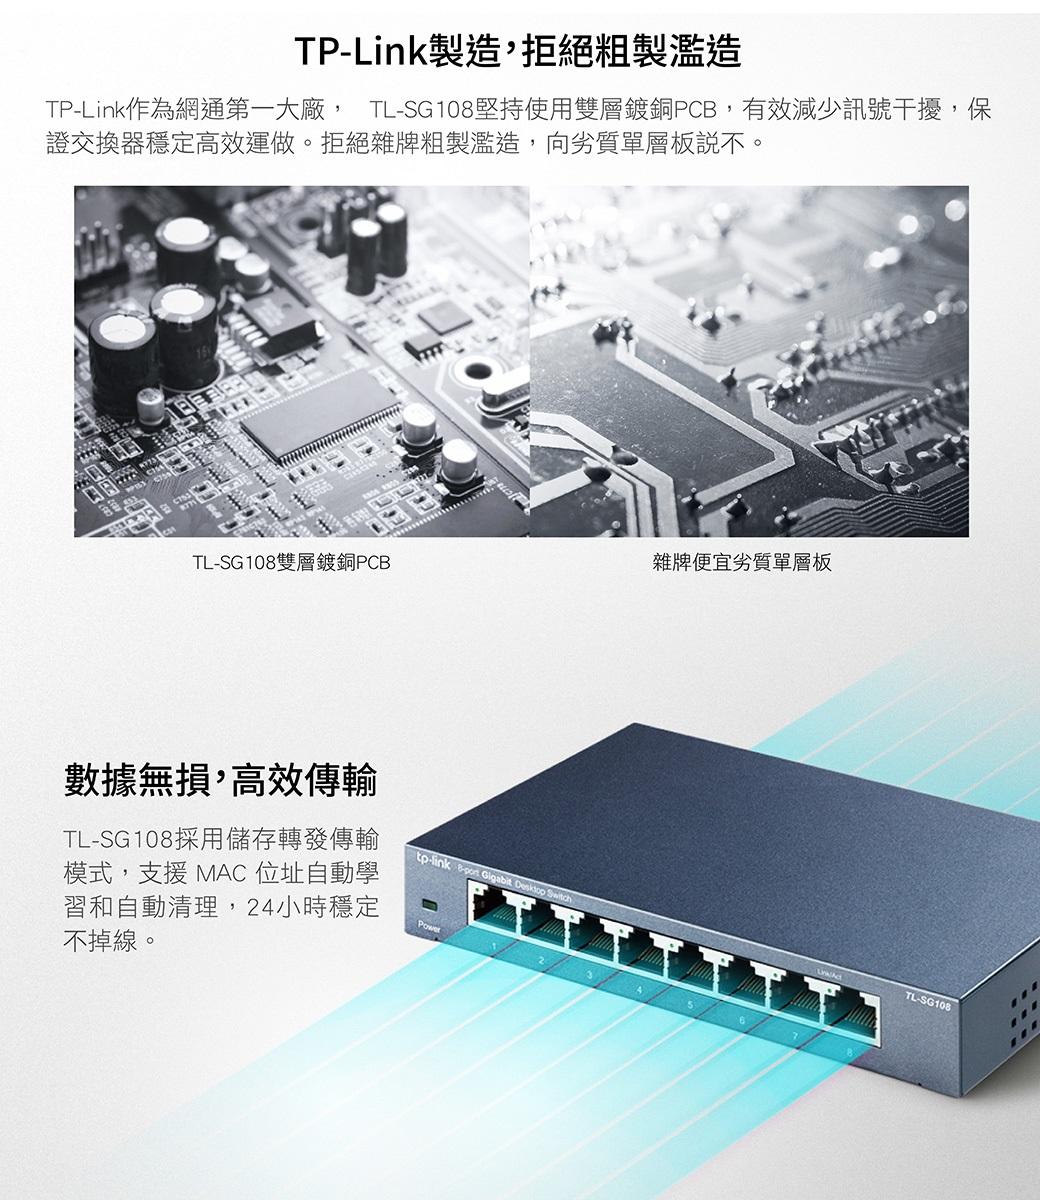 【宏華資訊廣場】TP-Link - TL-SG108 8埠 10/100/1000Mbps專業級Gigabit交換器